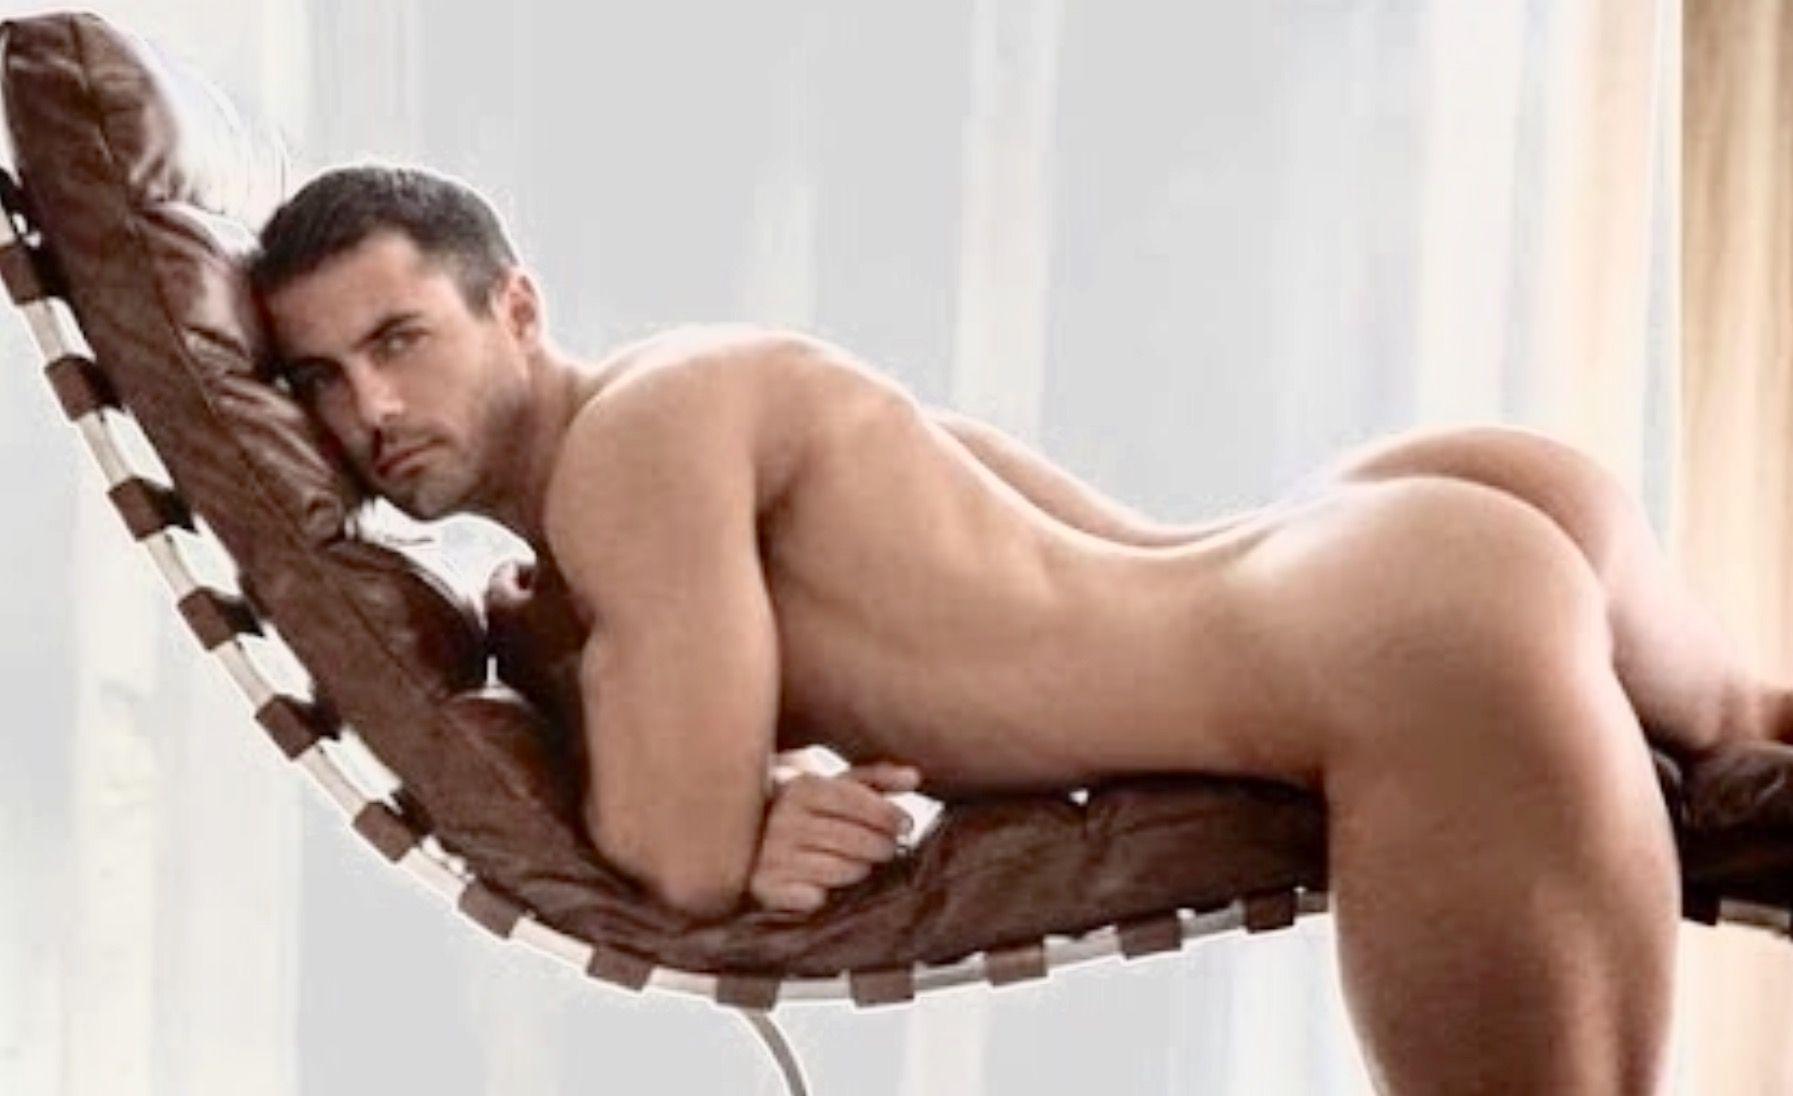 Are mistaken. Hot naked men with sex toys good interlocutors